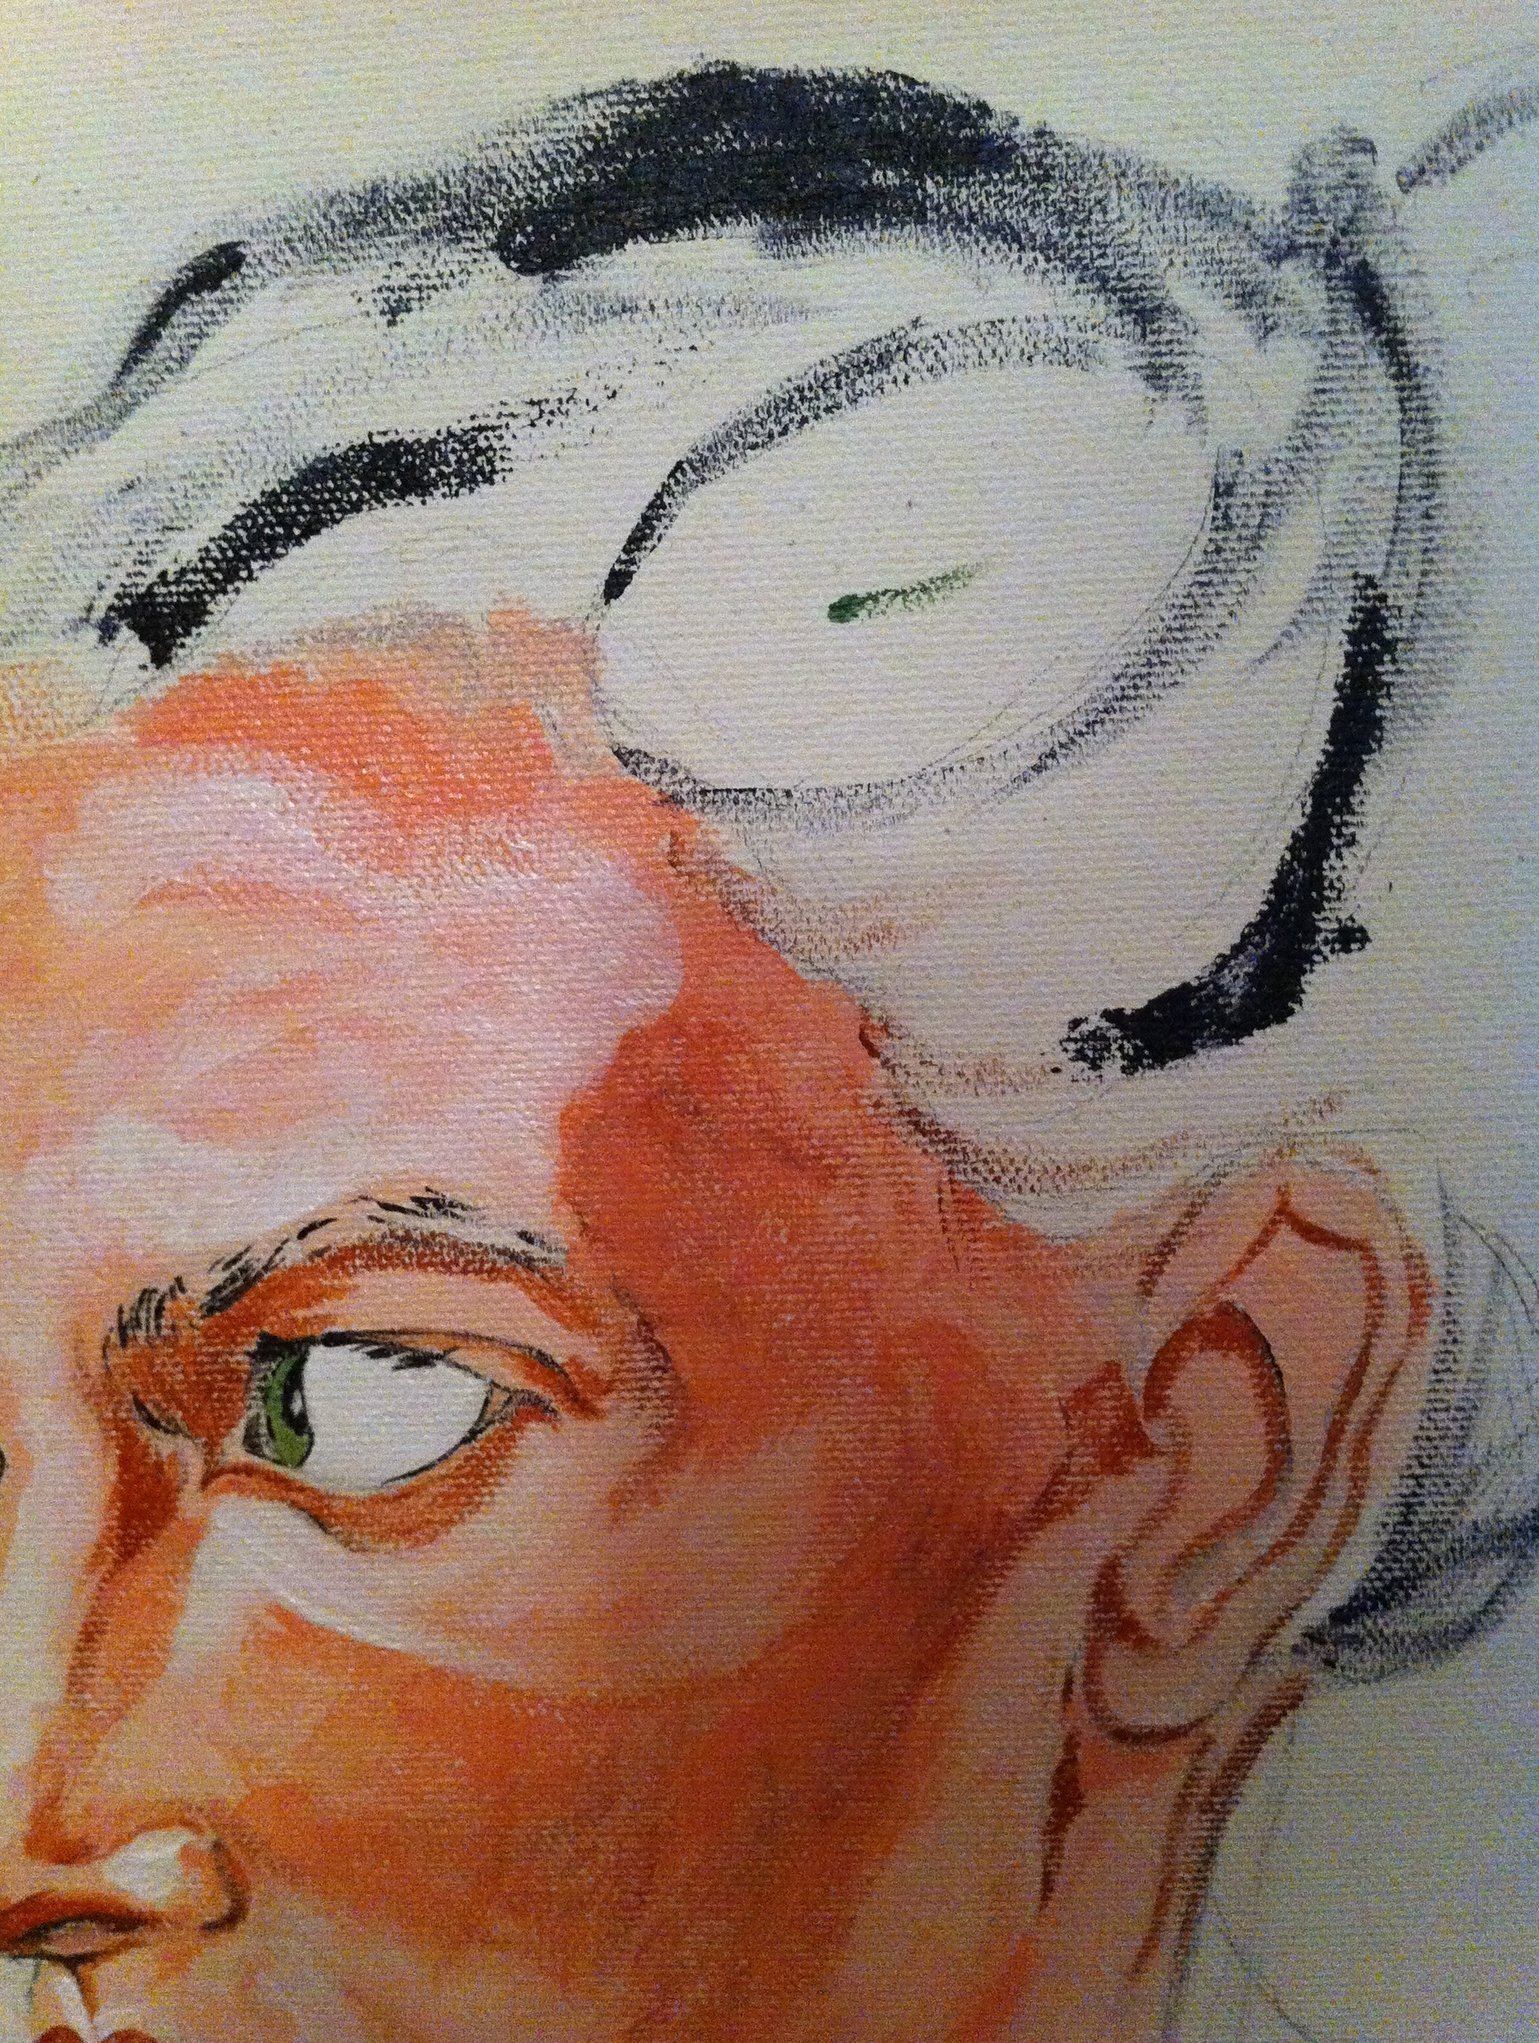 Self Portrait, Unfinished - Detail 2